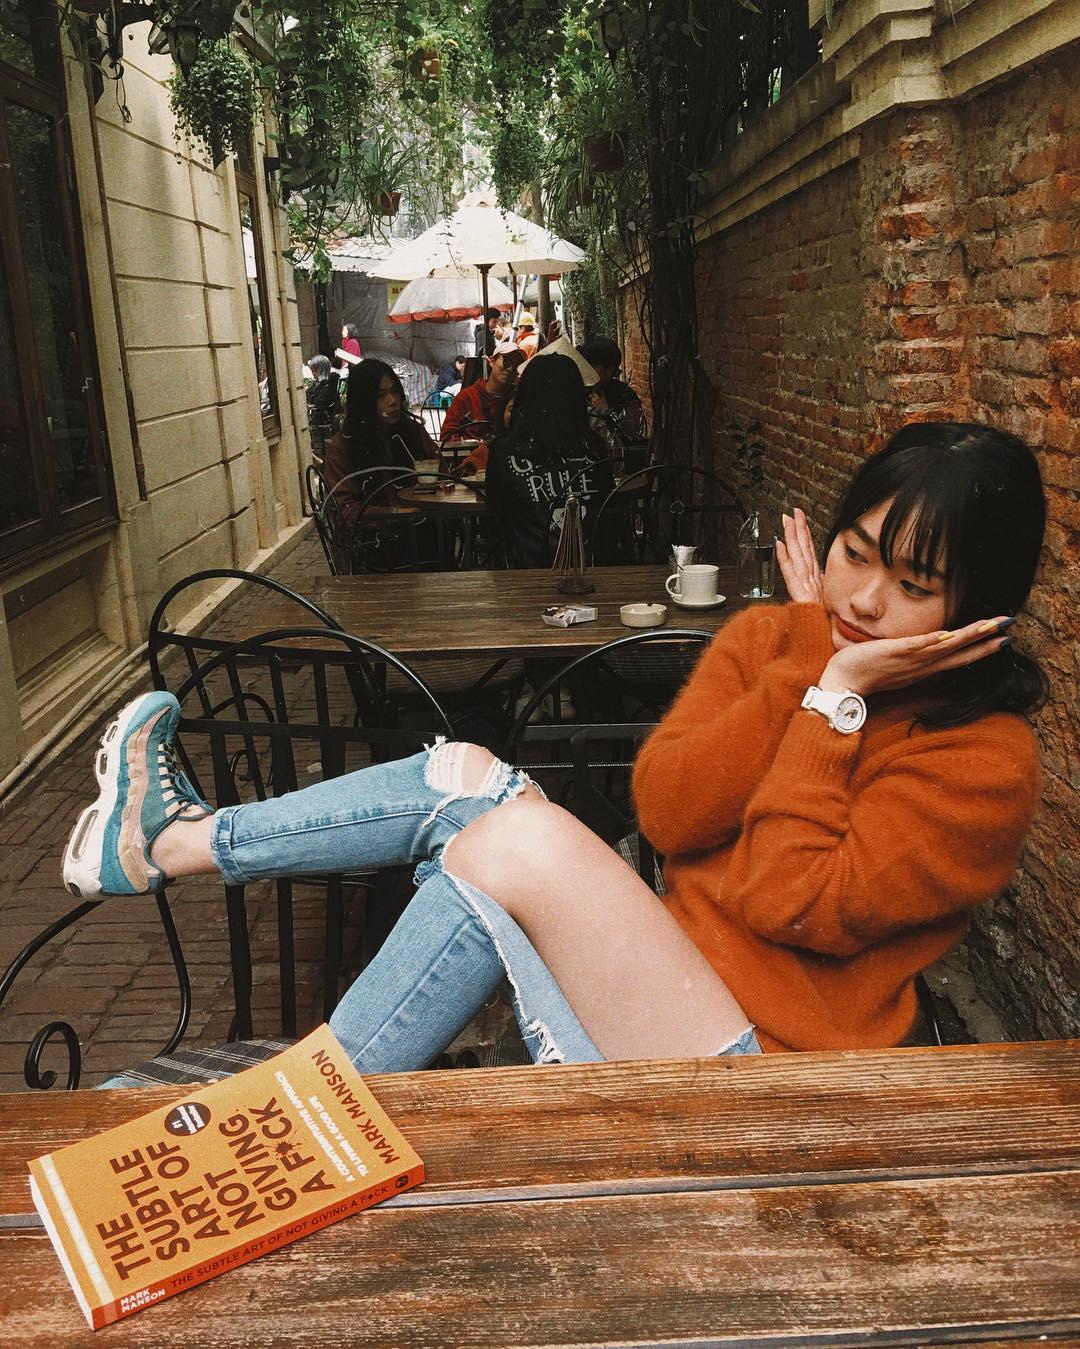 xofa_quan-cafe-mo-qua-dem-o-ha-noi